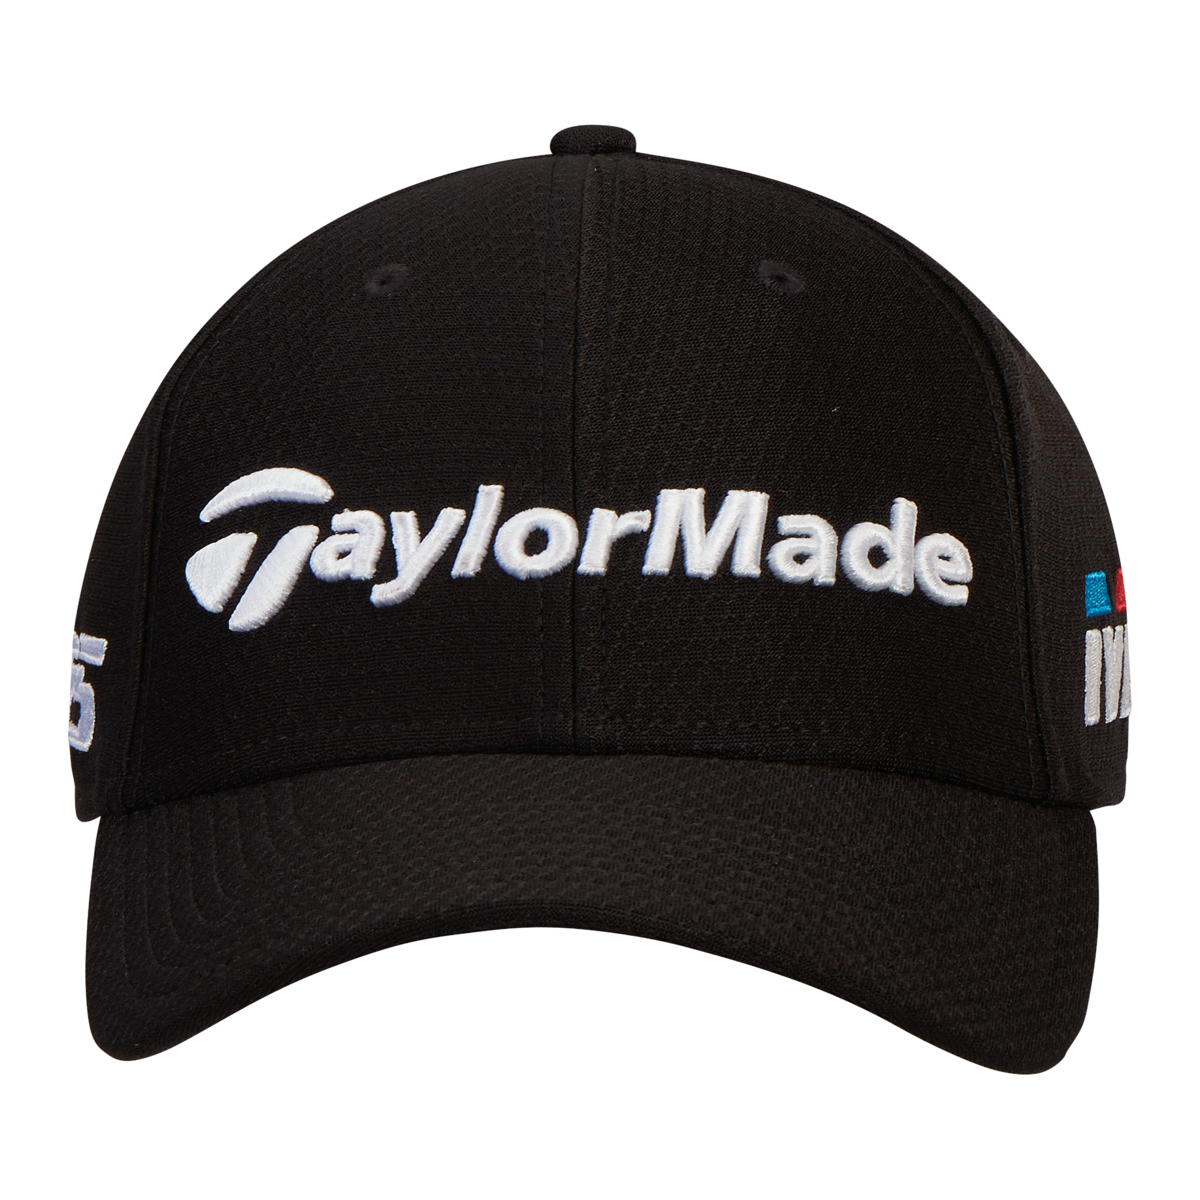 b0b2c823c6b Talyormade Tour New Era 39Thirty Hat - N6531117